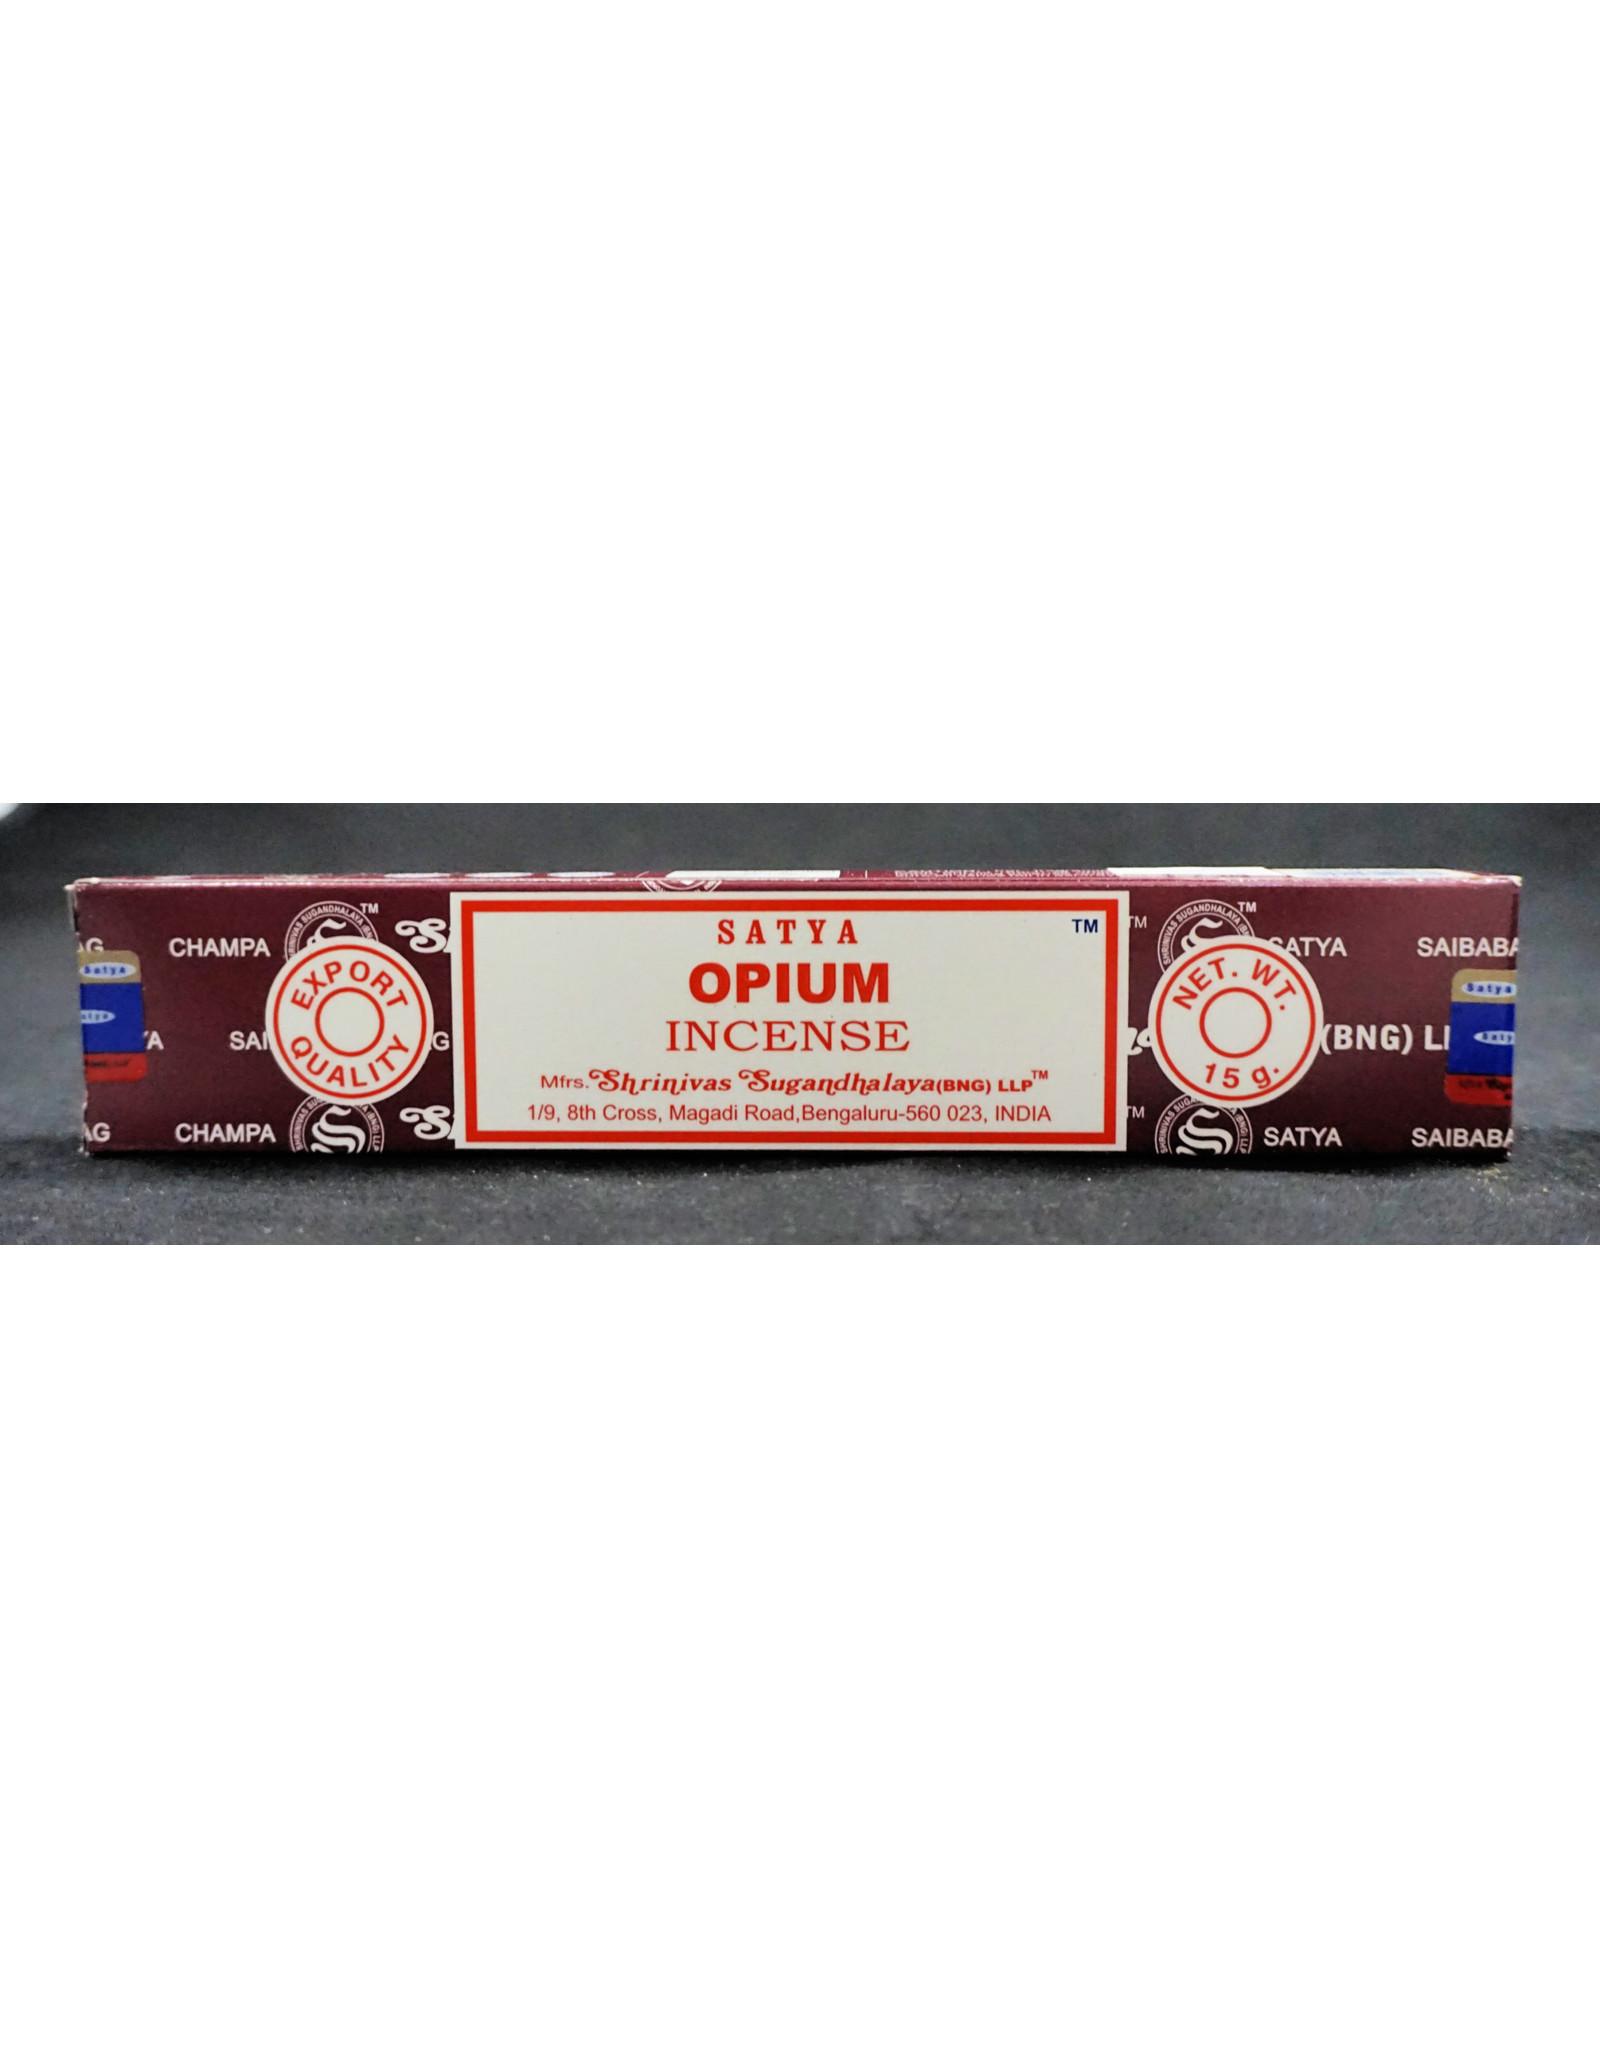 Satya Satya Incense 15g Opium